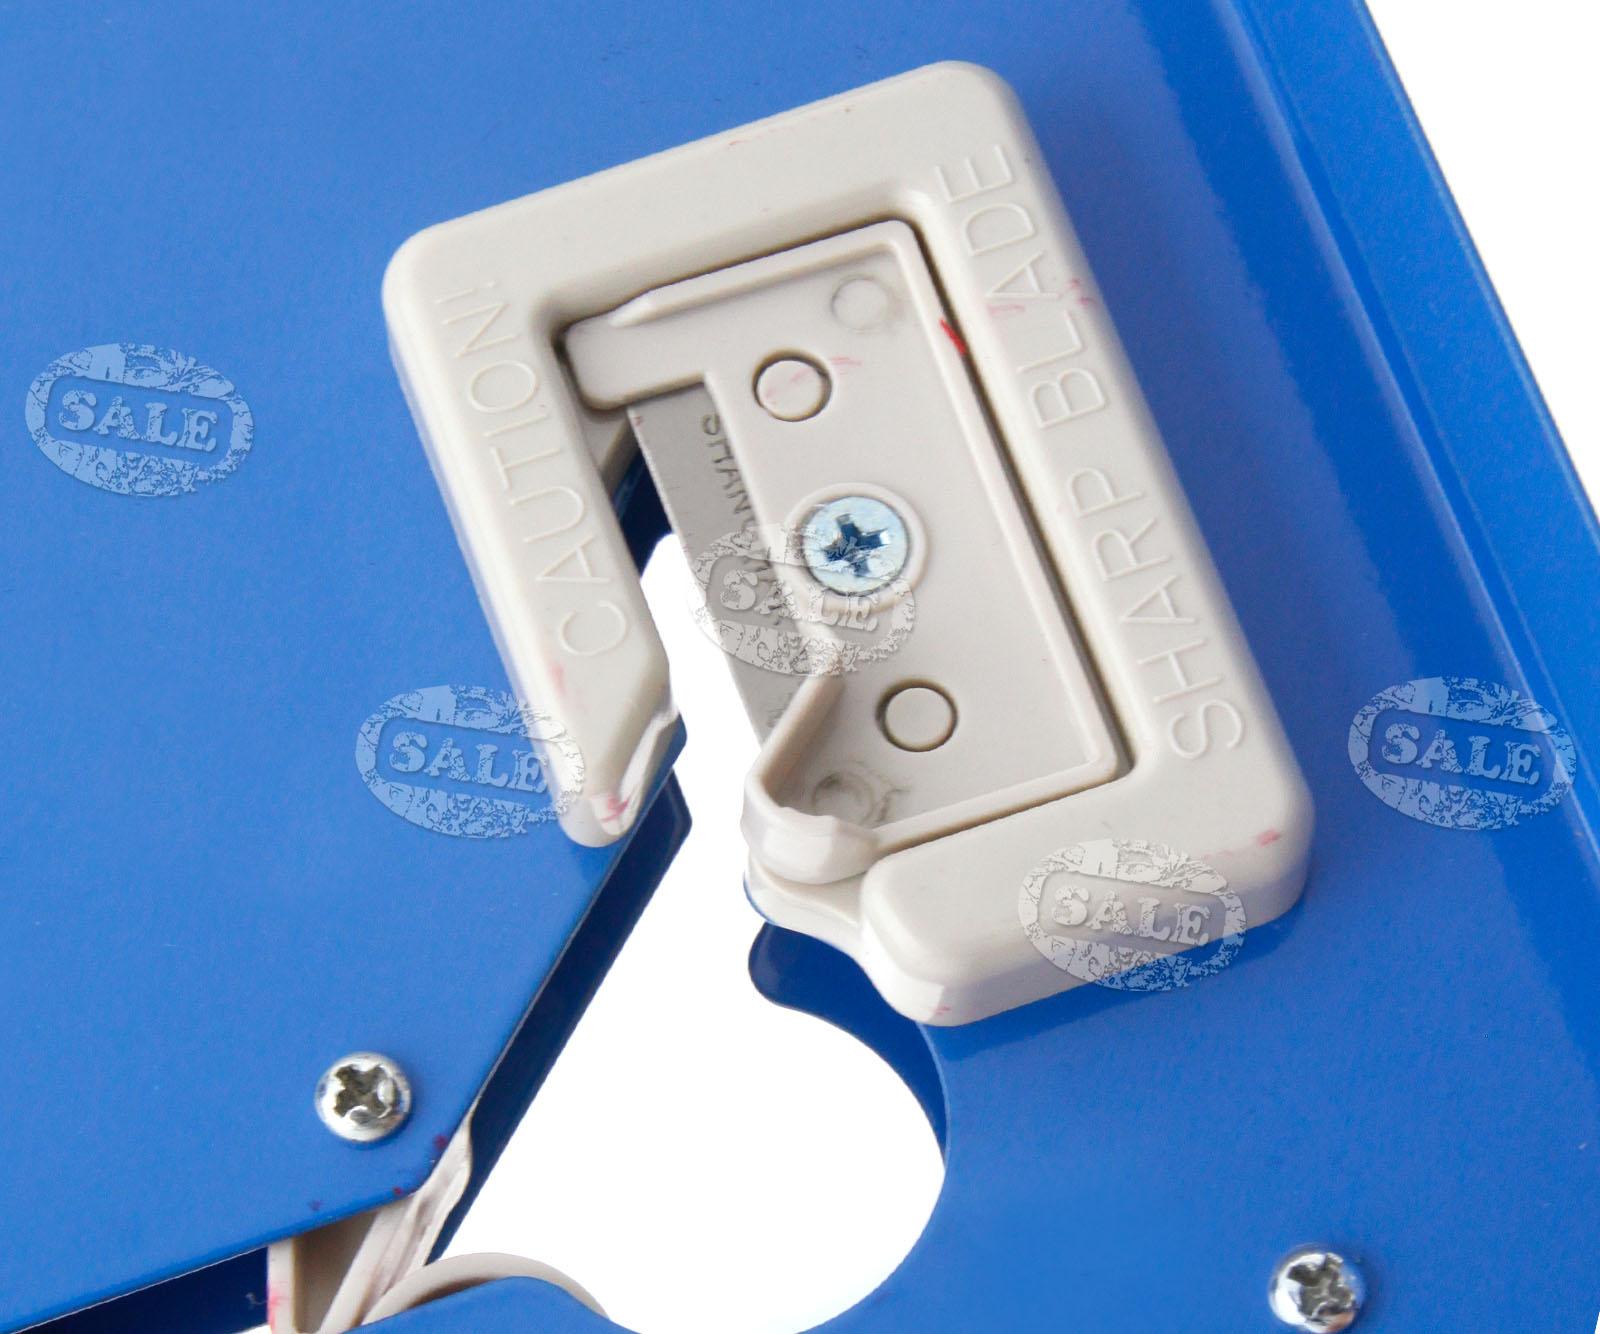 Plastic bag tape sealer - Upc 735548227205